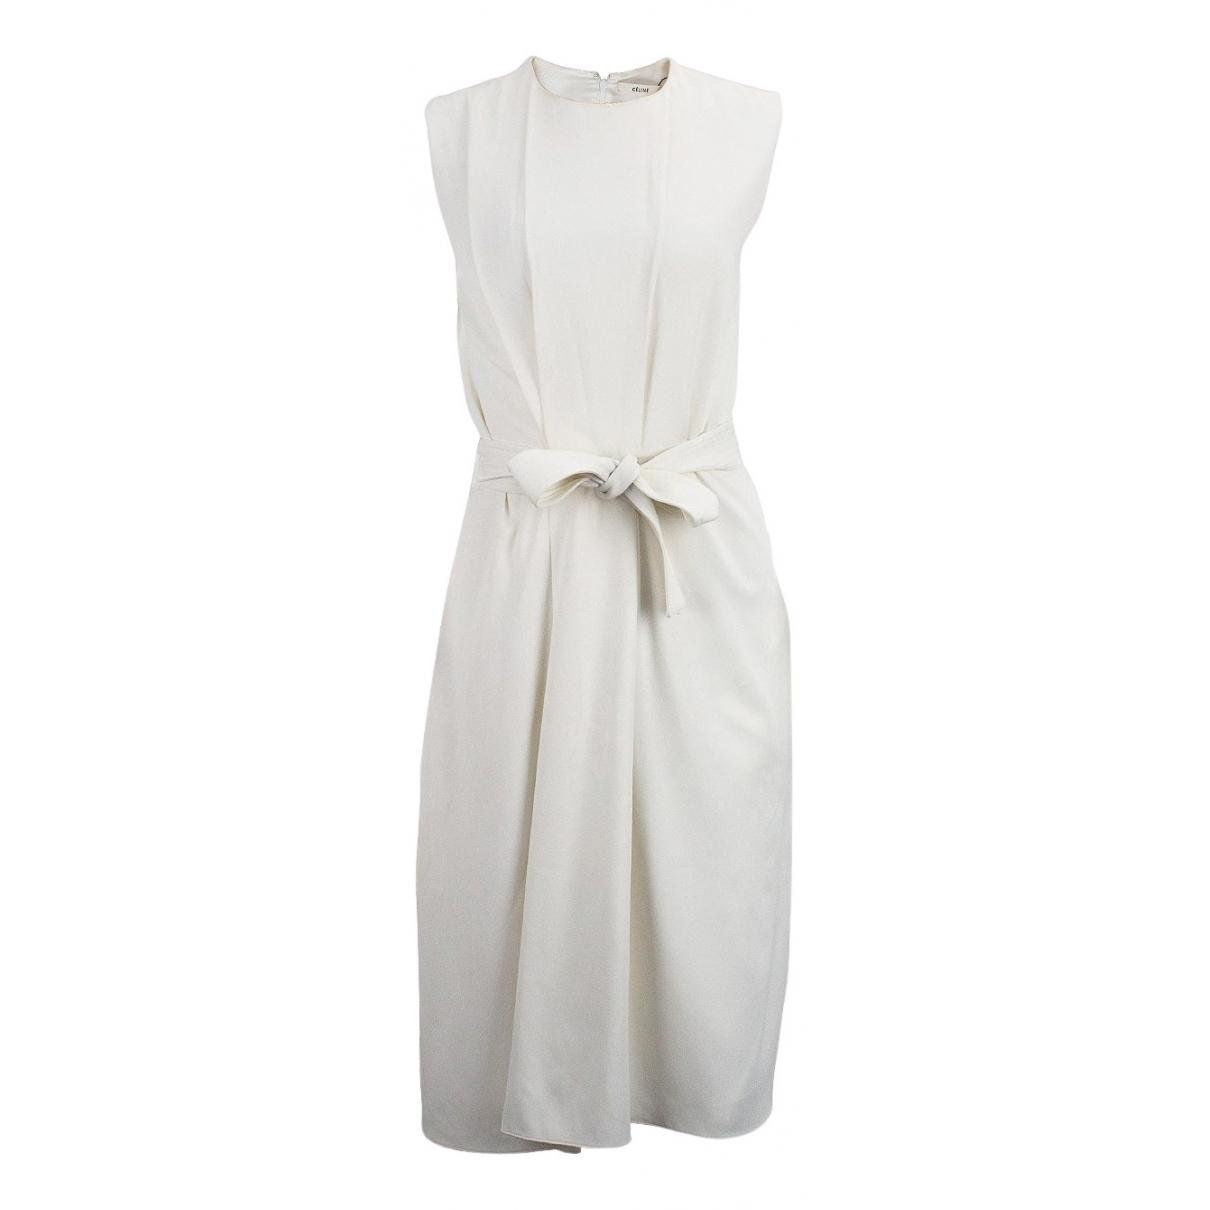 Celine N White dress for Women 36 IT